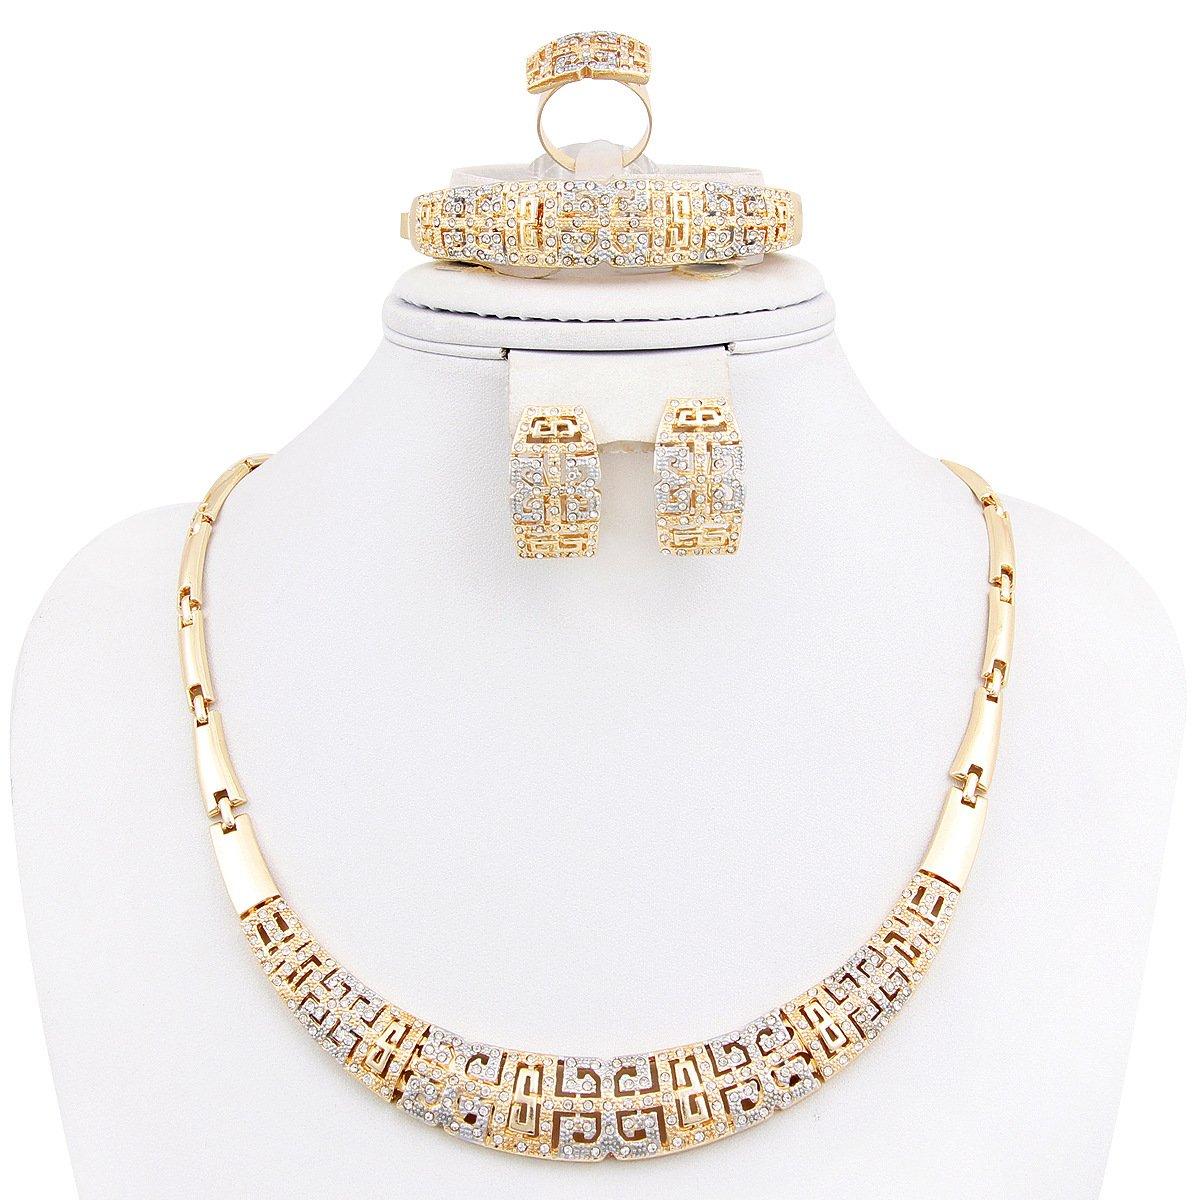 Fashion Jewelry Set Women 18k Gold Plated Necklace Bracelet Earrings Present Set by NYKKOLA